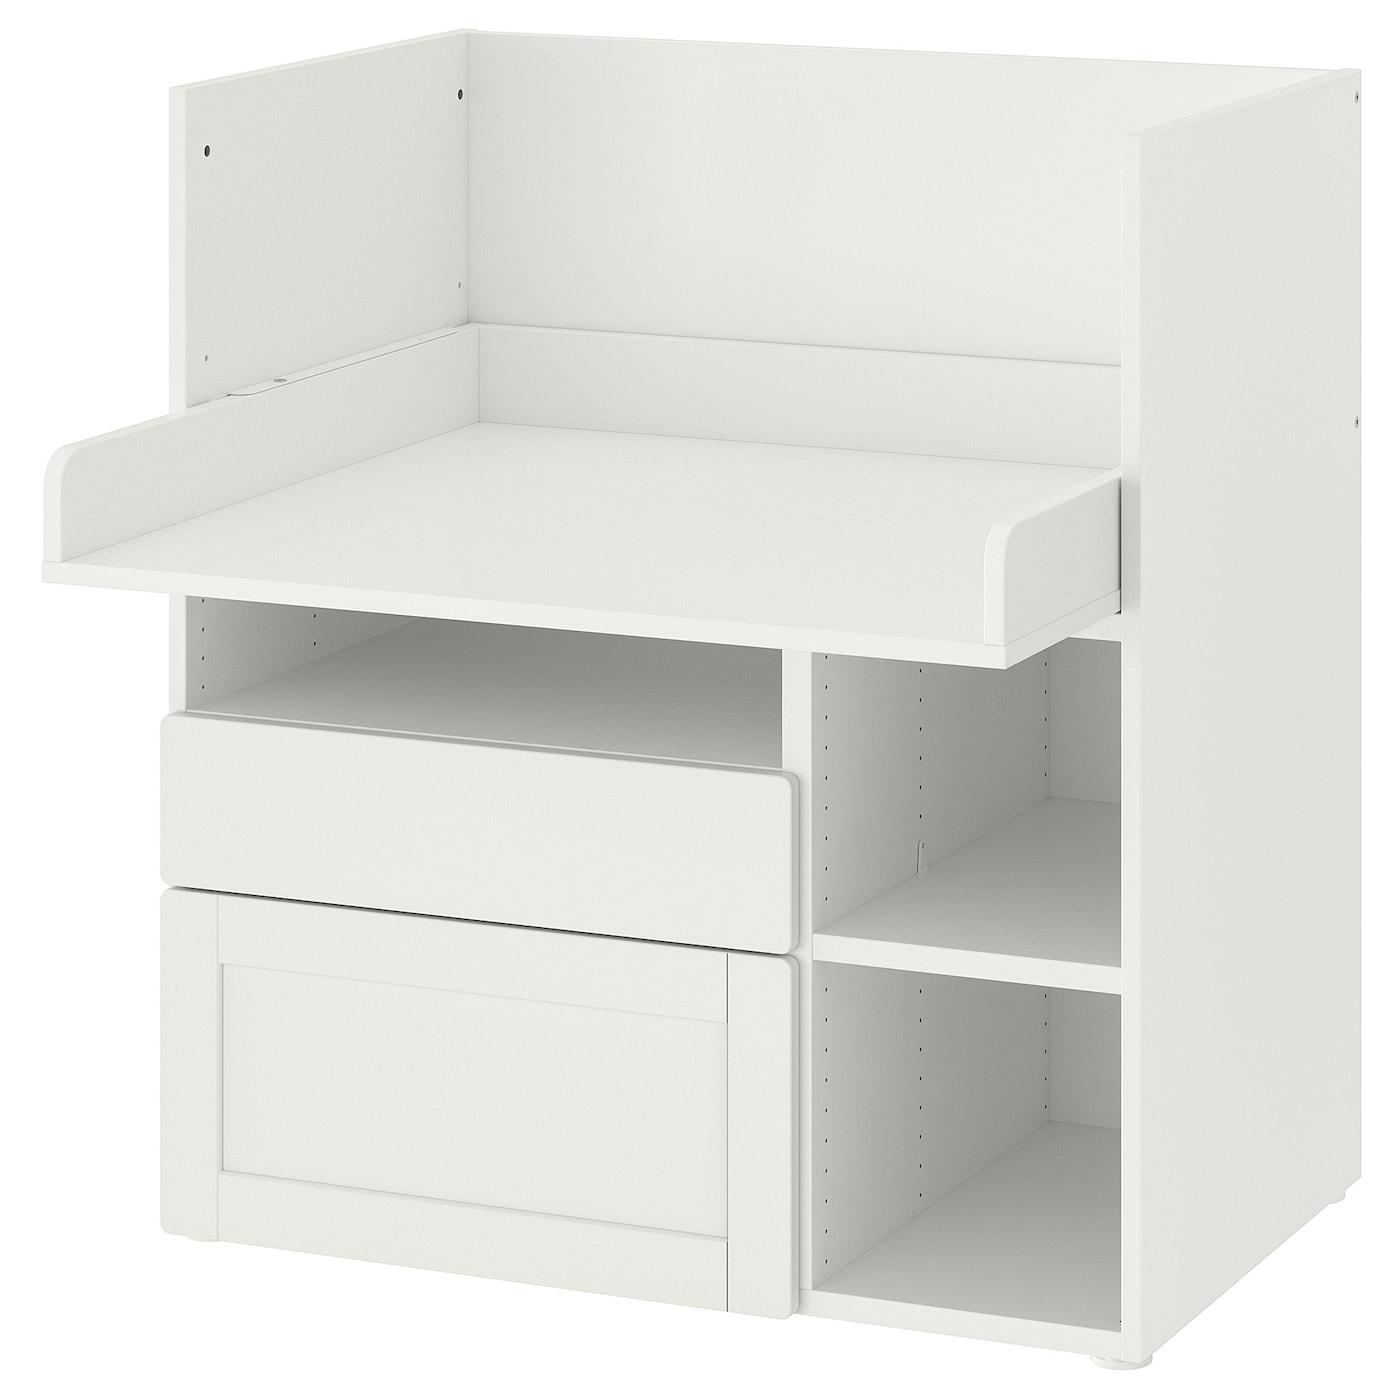 SMÅSTAD PLATSA Regal weiß mit Rahmen2 Schubladen IKEA